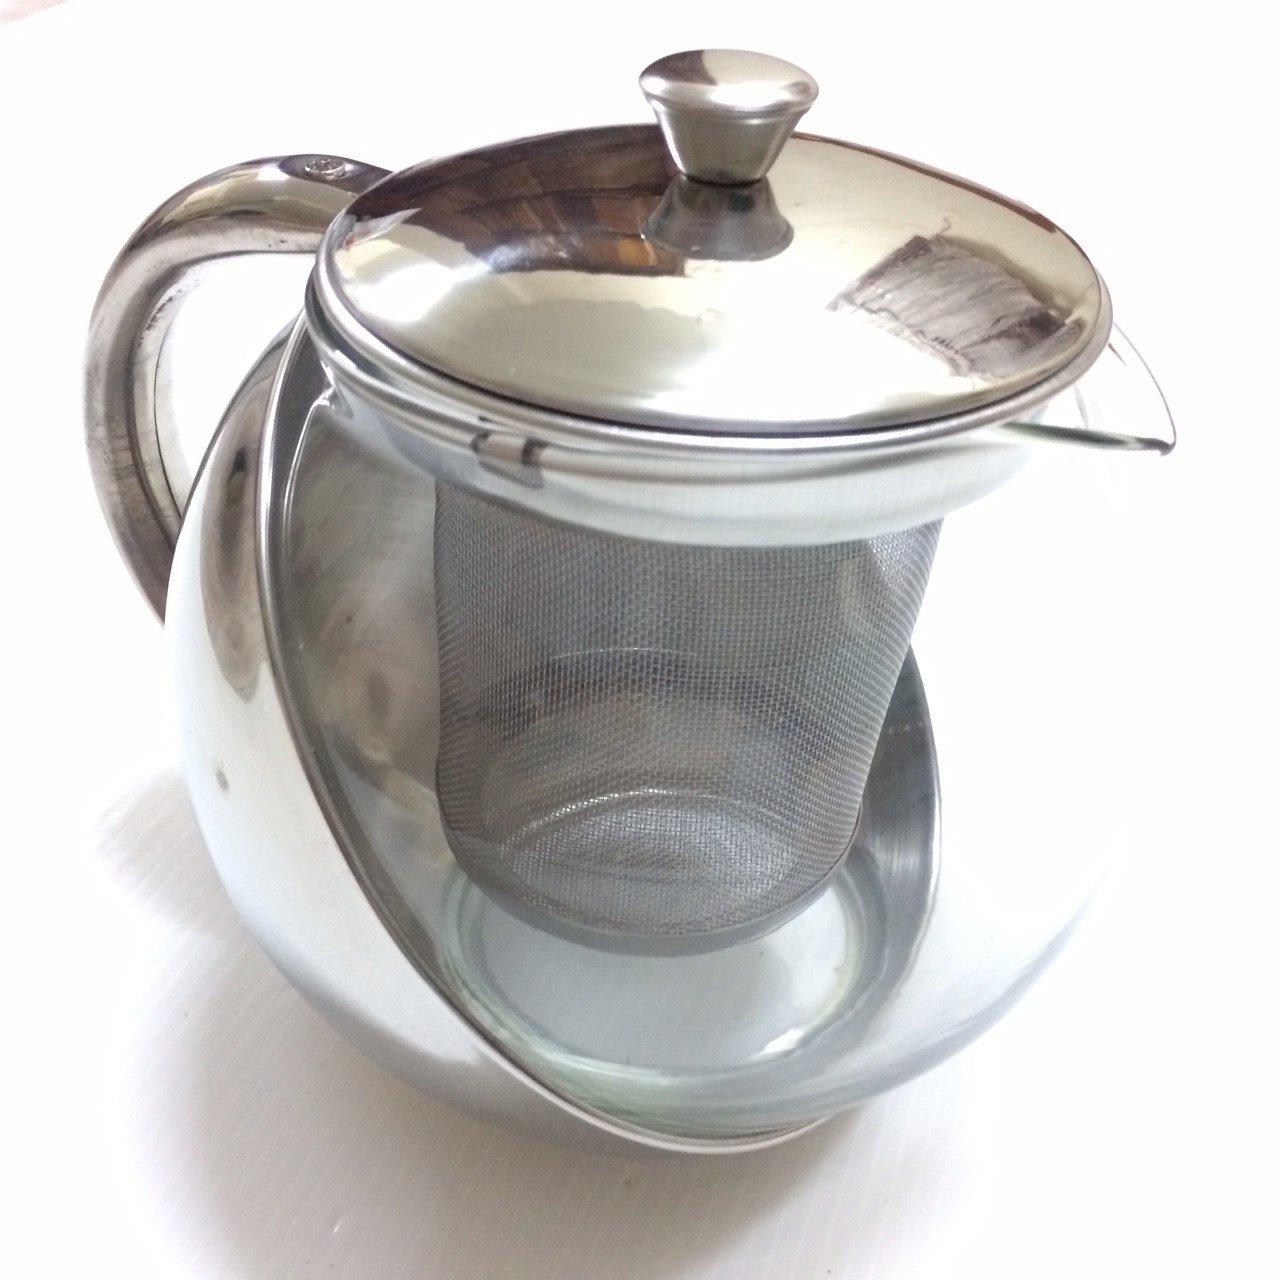 Half-Moon Teapot and Tea Strainer Set & Lid Teapot Kettle Kitchen Dining 25.36 oz. Pisana1979